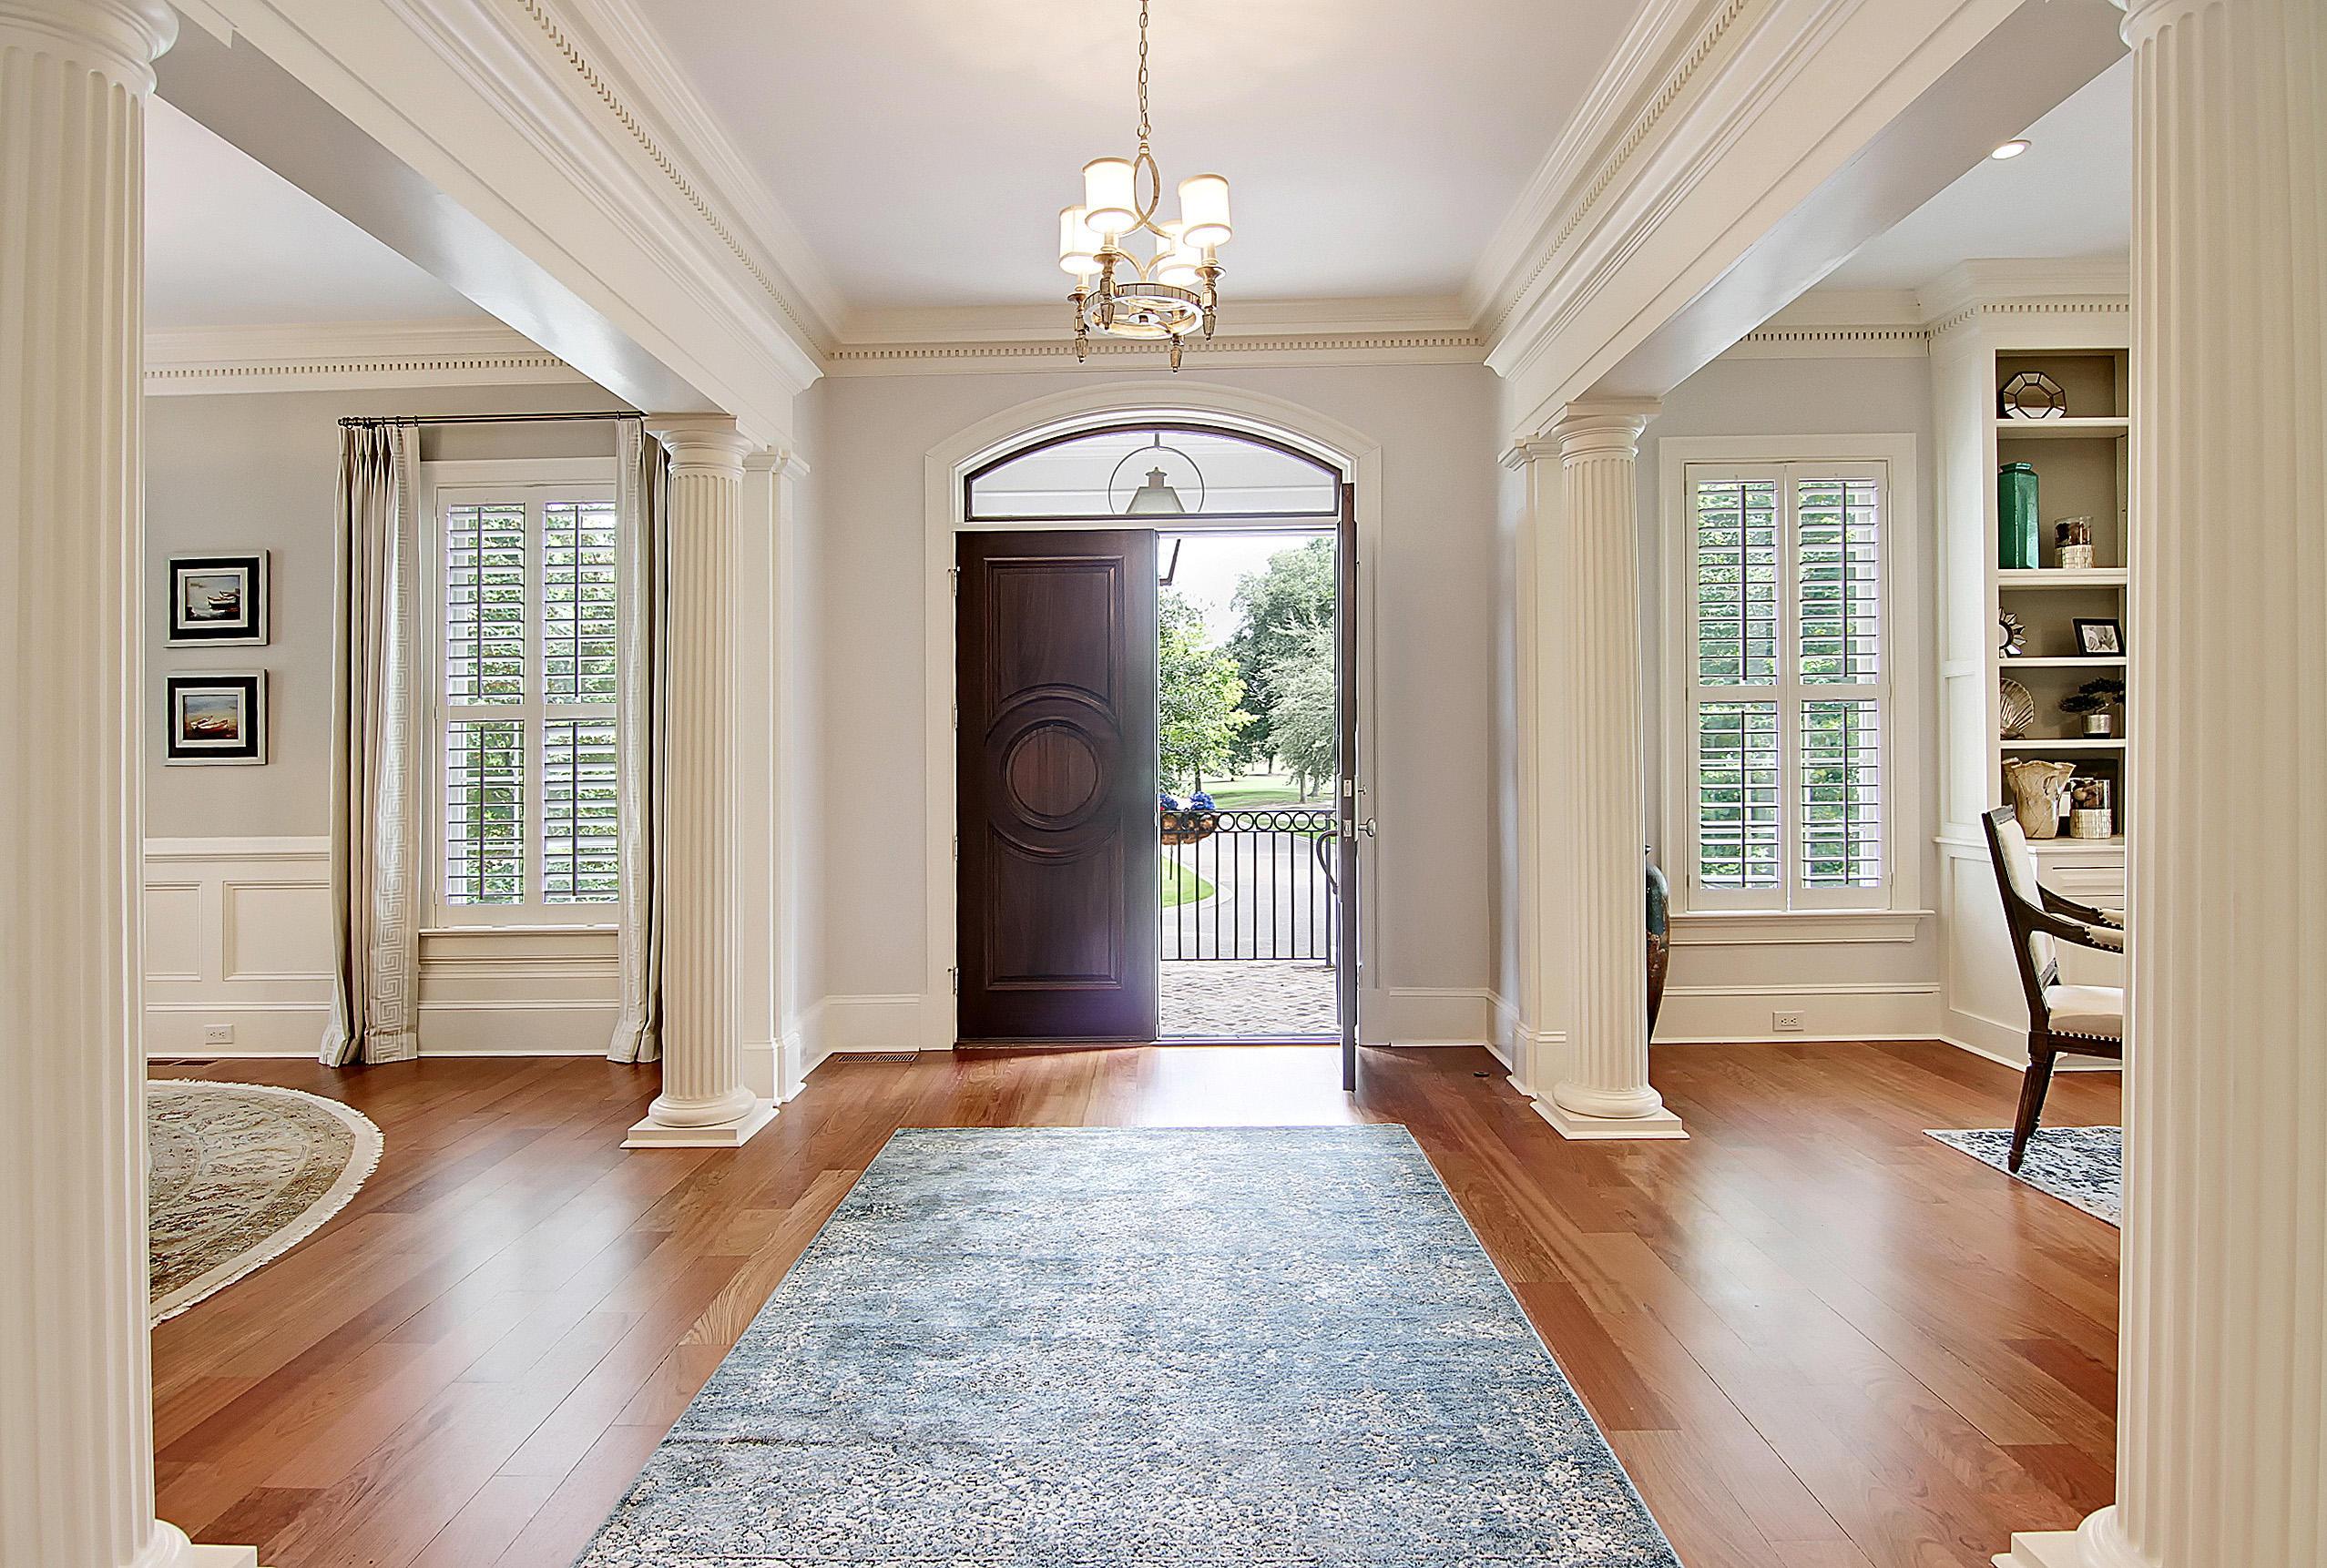 Daniel Island Homes For Sale - 79 Dalton, Charleston, SC - 58